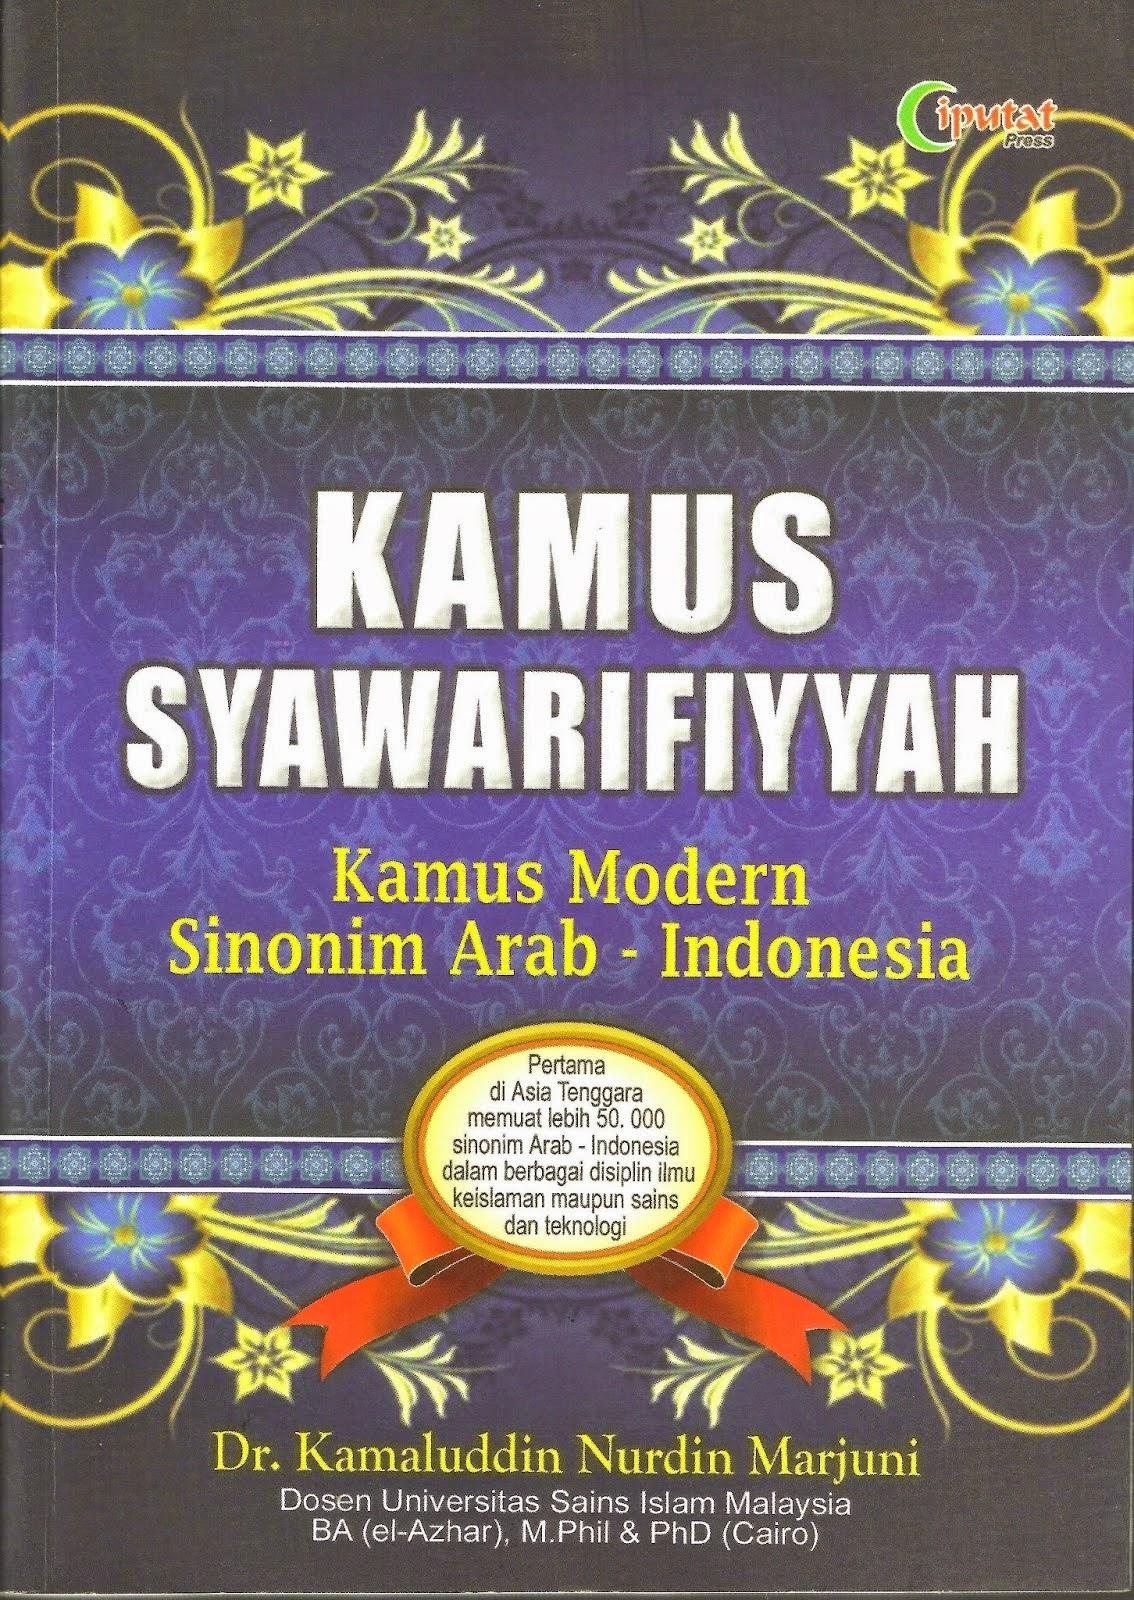 KAMUS SYAWARIFIYYAH (SINONIM ARAB INDONESIA)